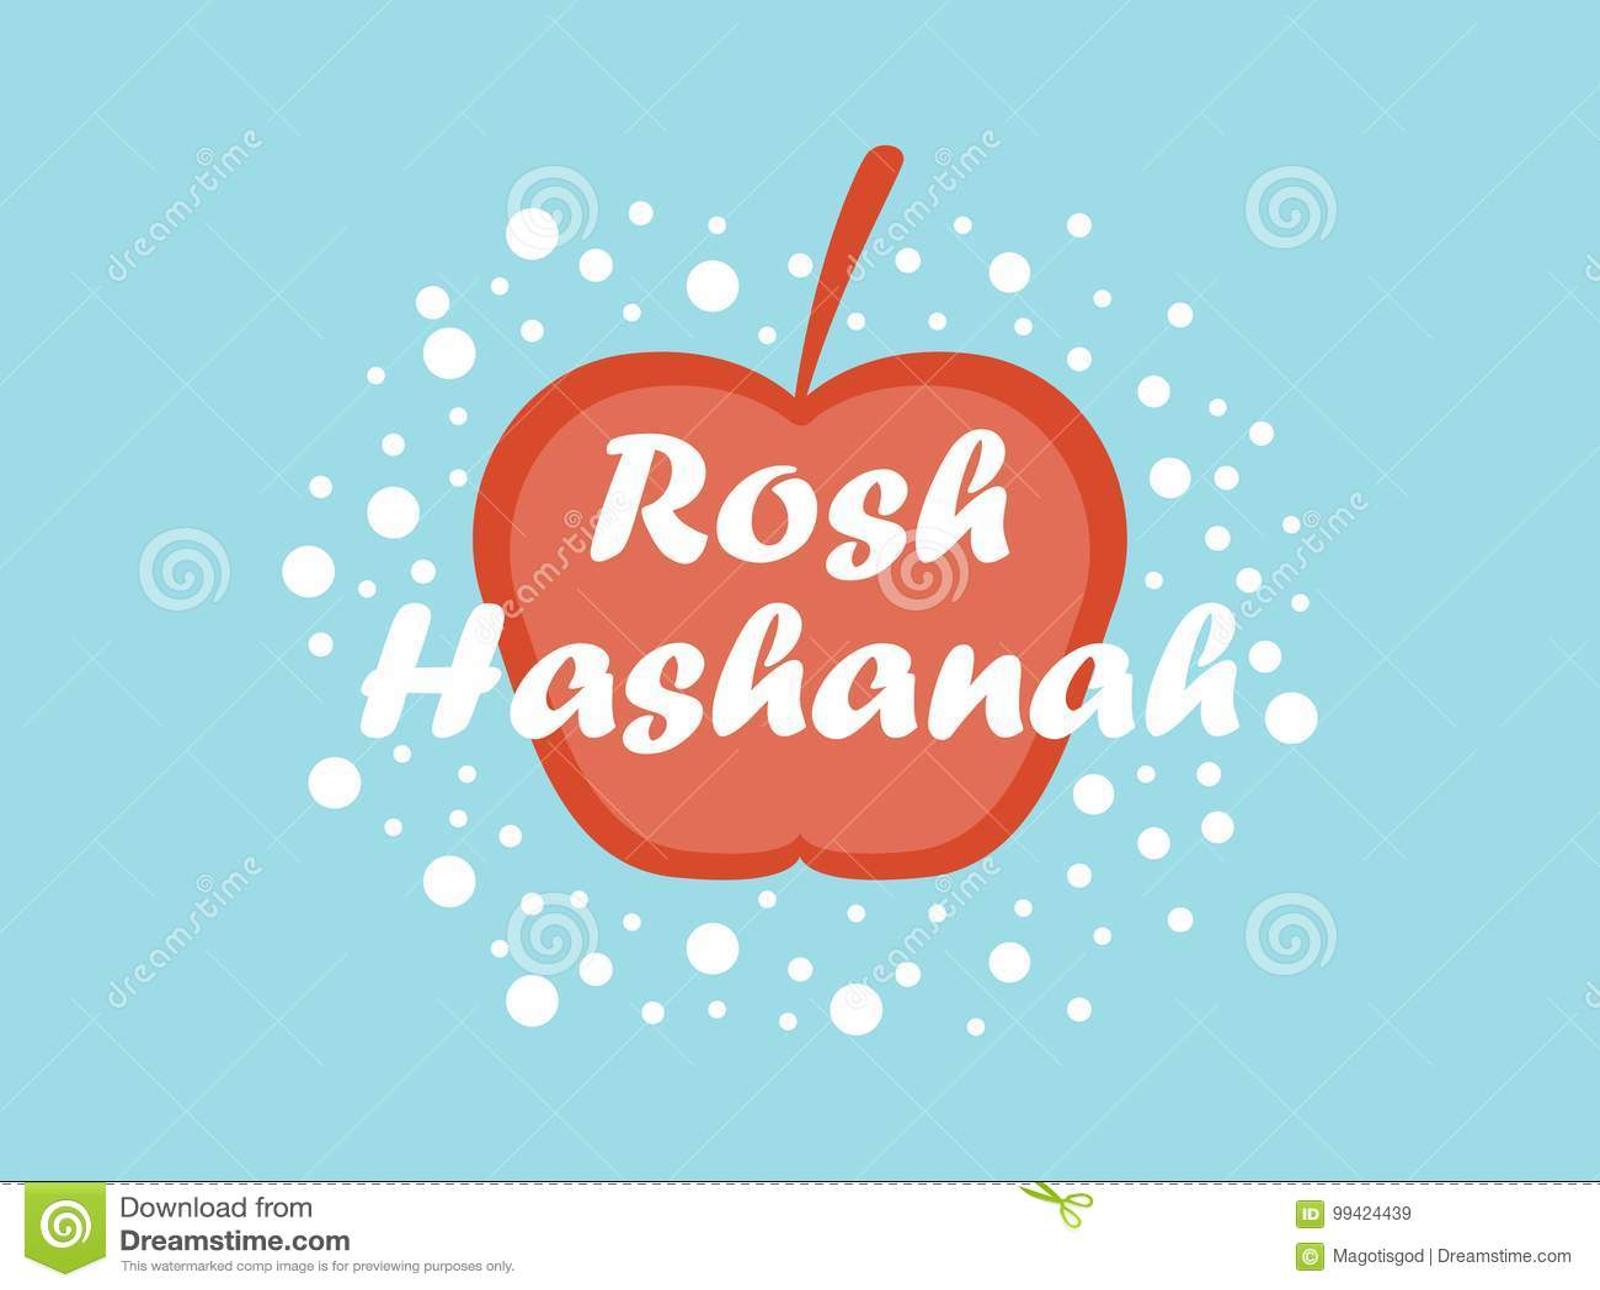 Rosh hashanah greeting card design jewish new year shana tova red download rosh hashanah greeting card design jewish new year shana tova red apple m4hsunfo